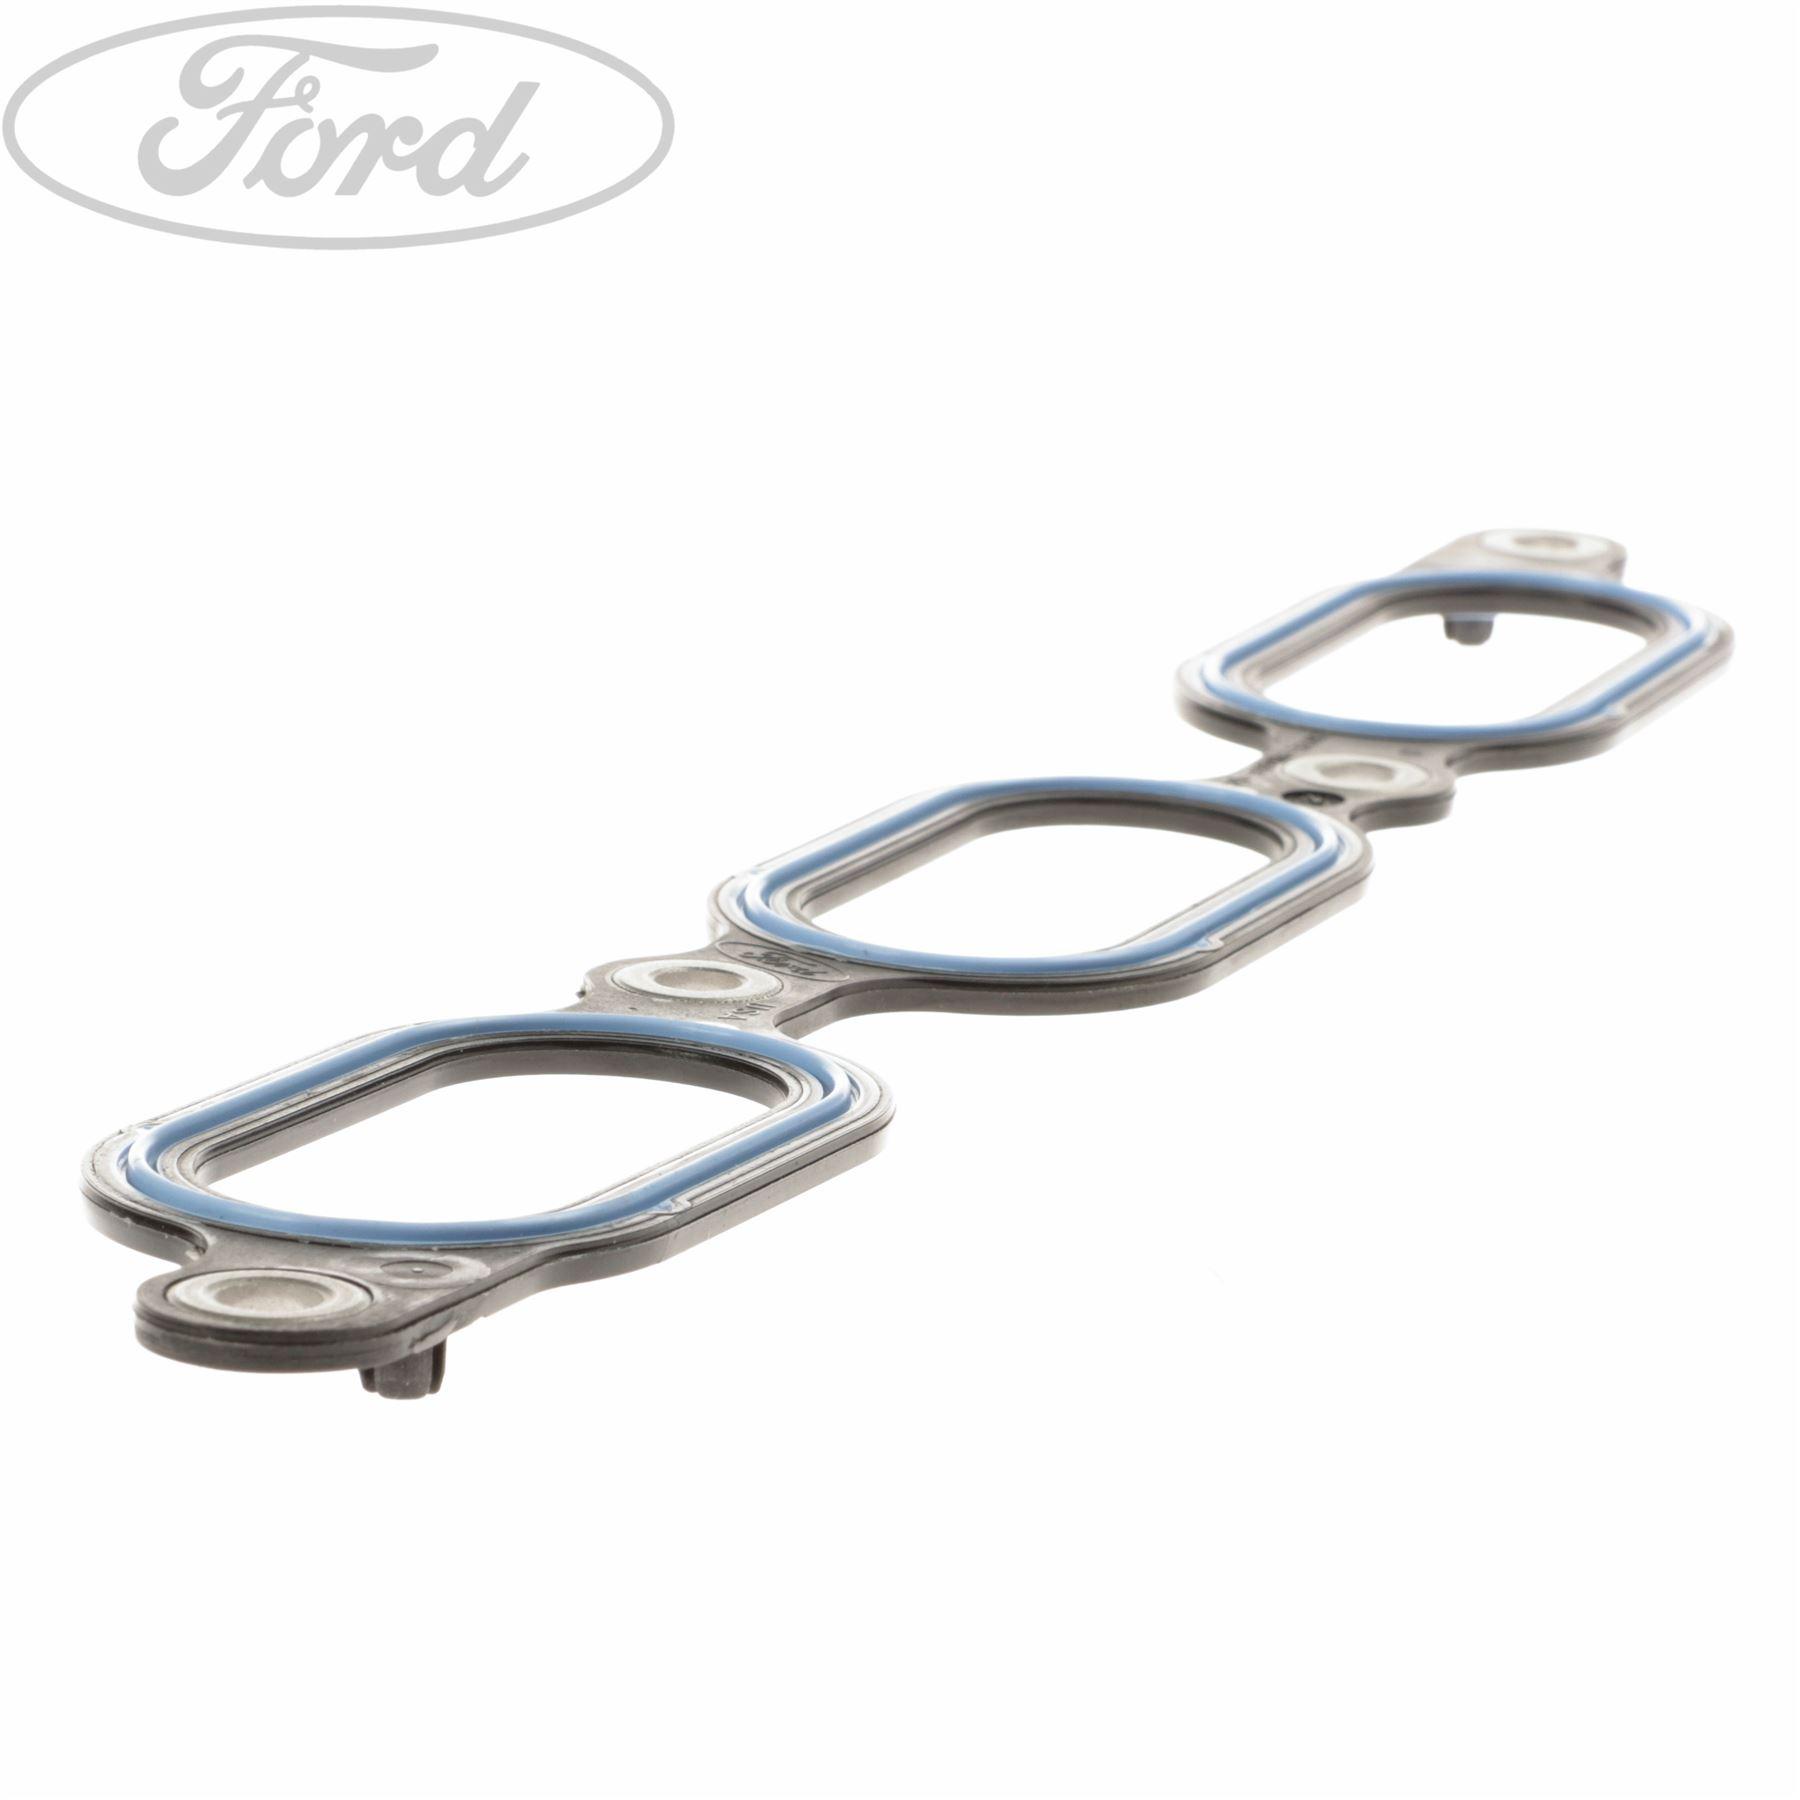 Genuine Ford Mondeo Mk3 Duratec V6 Intake Manifold Gasket